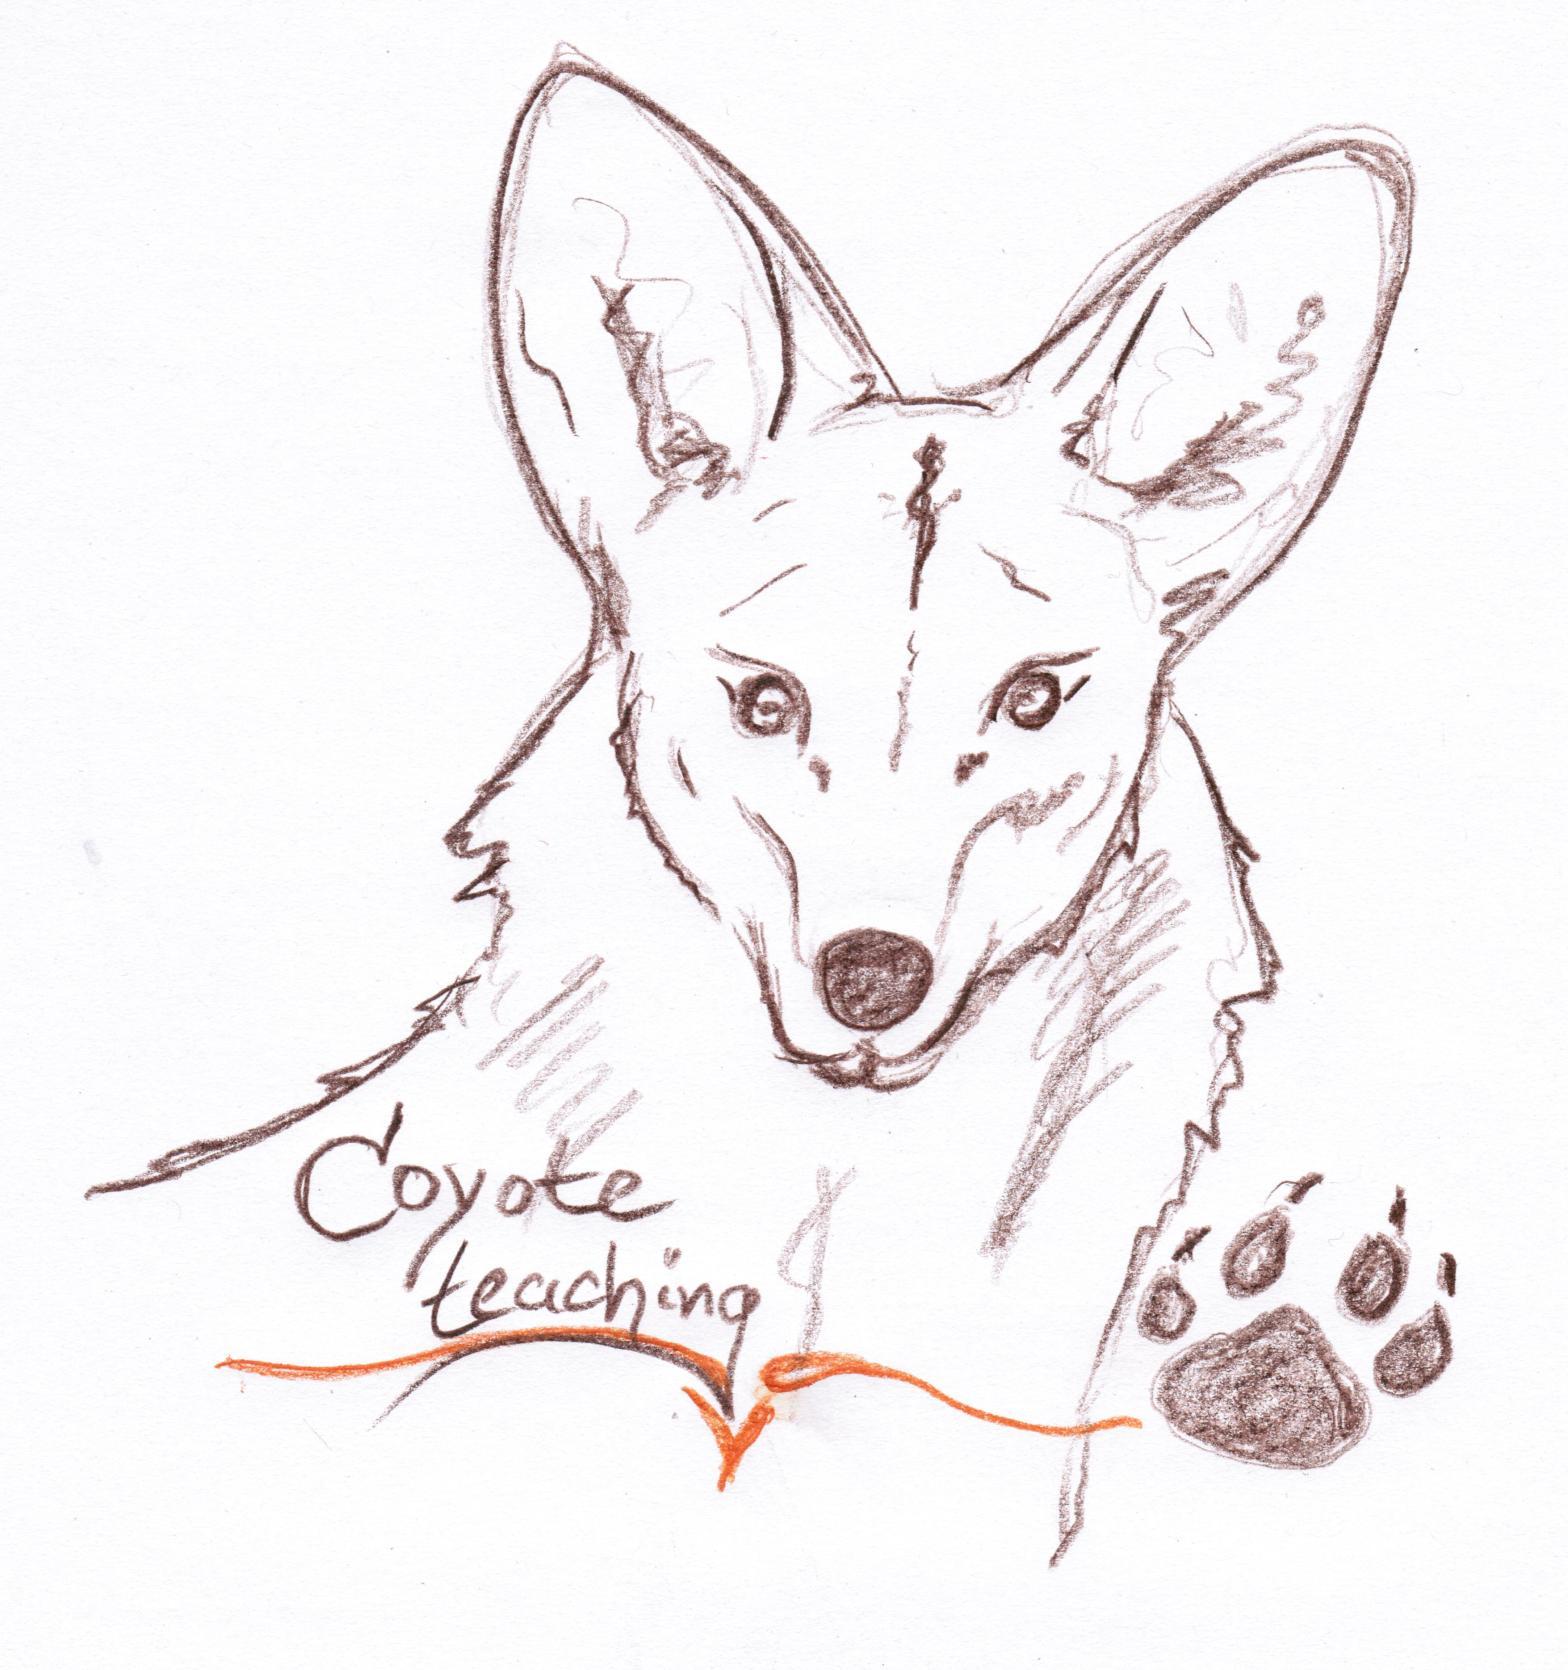 coyoteteach-1525199208-26.jpg